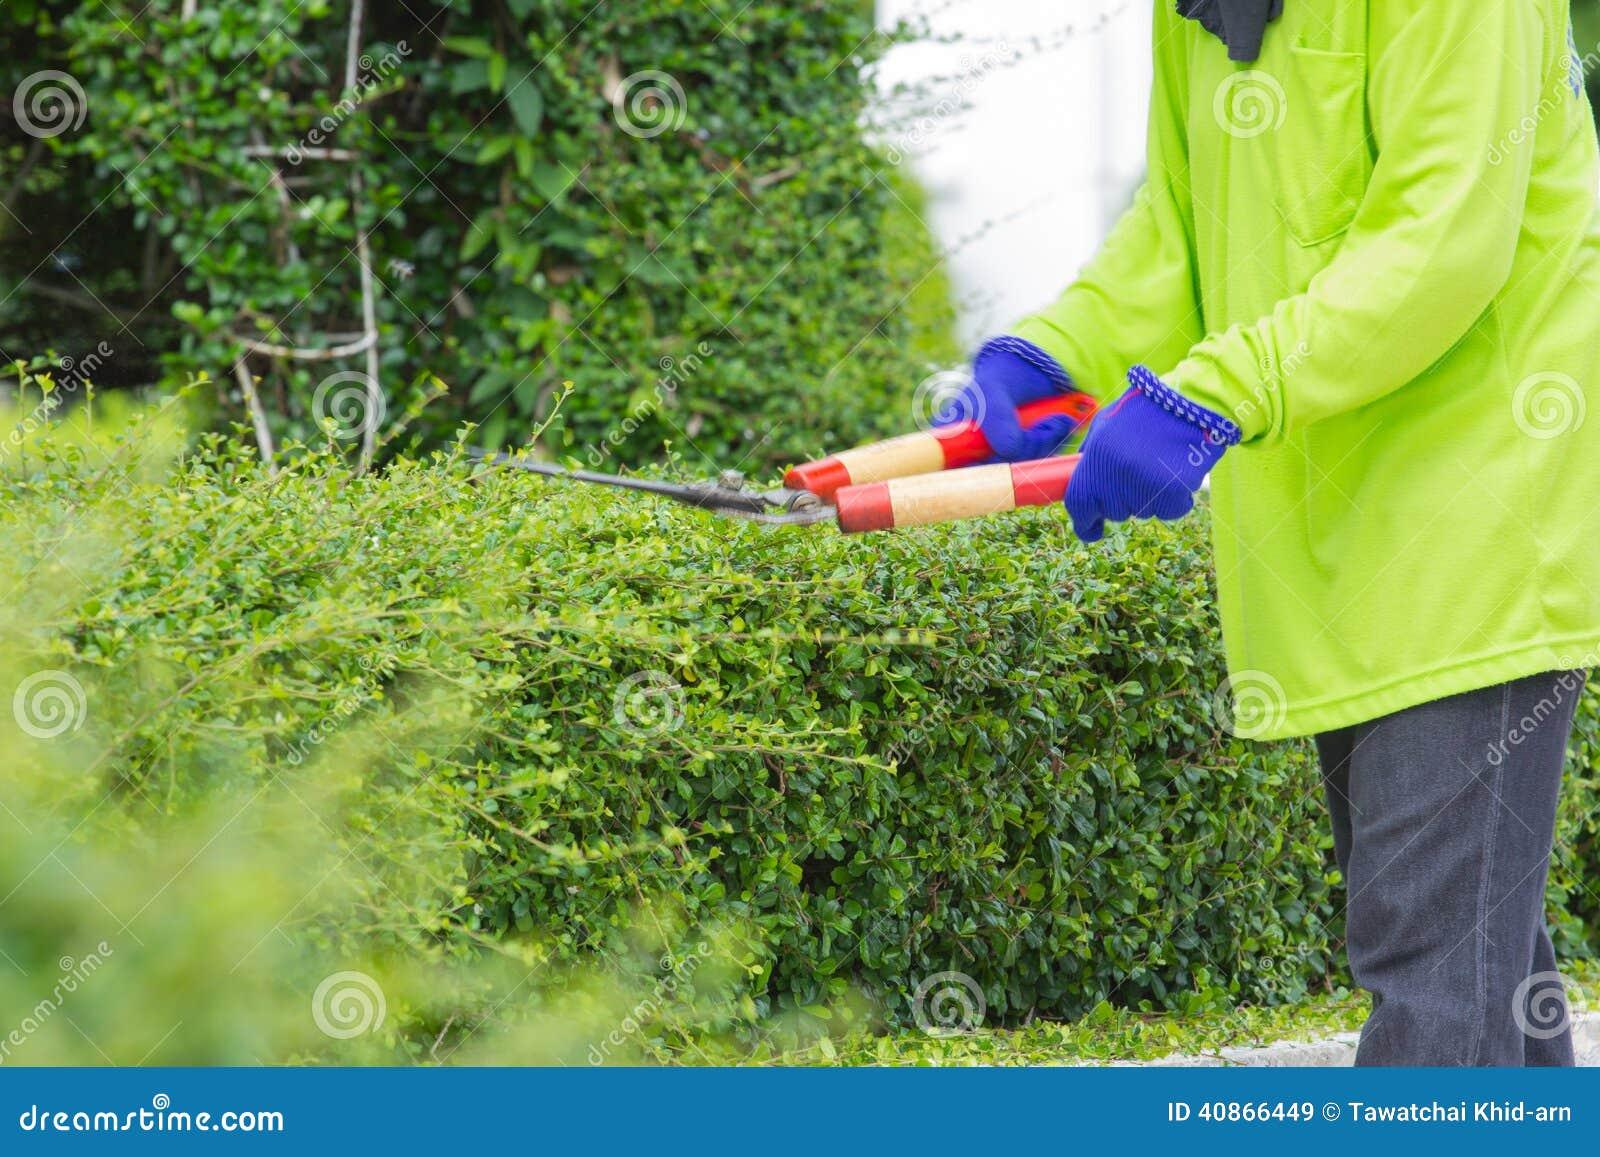 Unscharfes Bild eines Mannes, der grünen Busch (Bewegungsunschärfe, schneidet Bild)